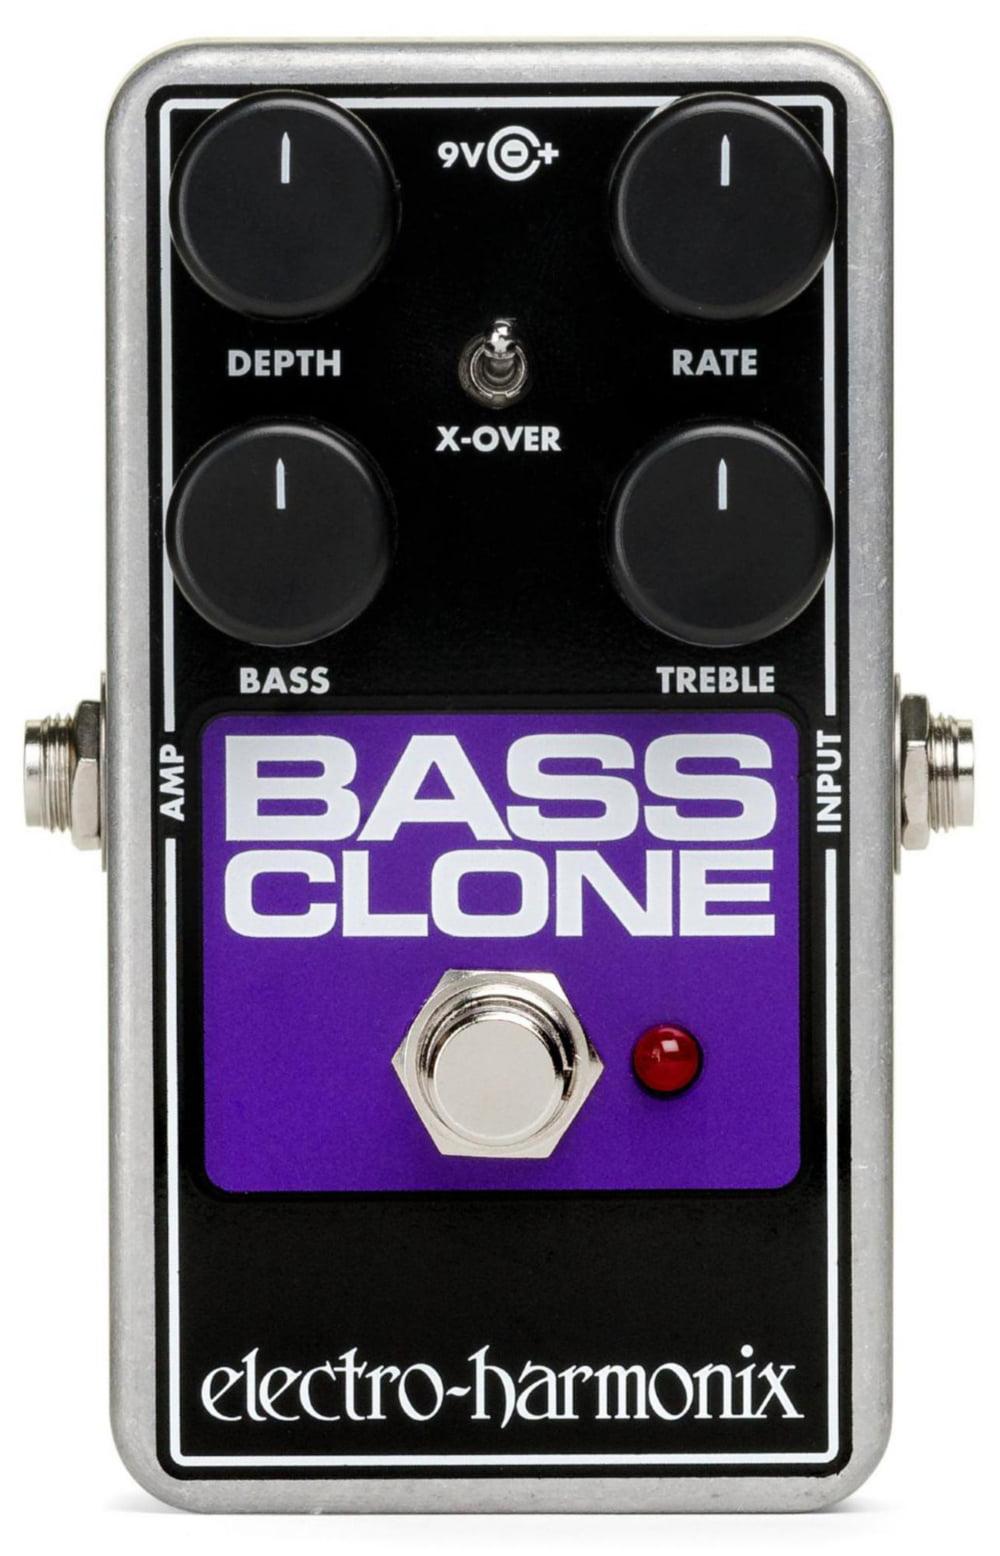 Electro-Harmonix Bass Clone Analog Chorus by Electro-Harmonix